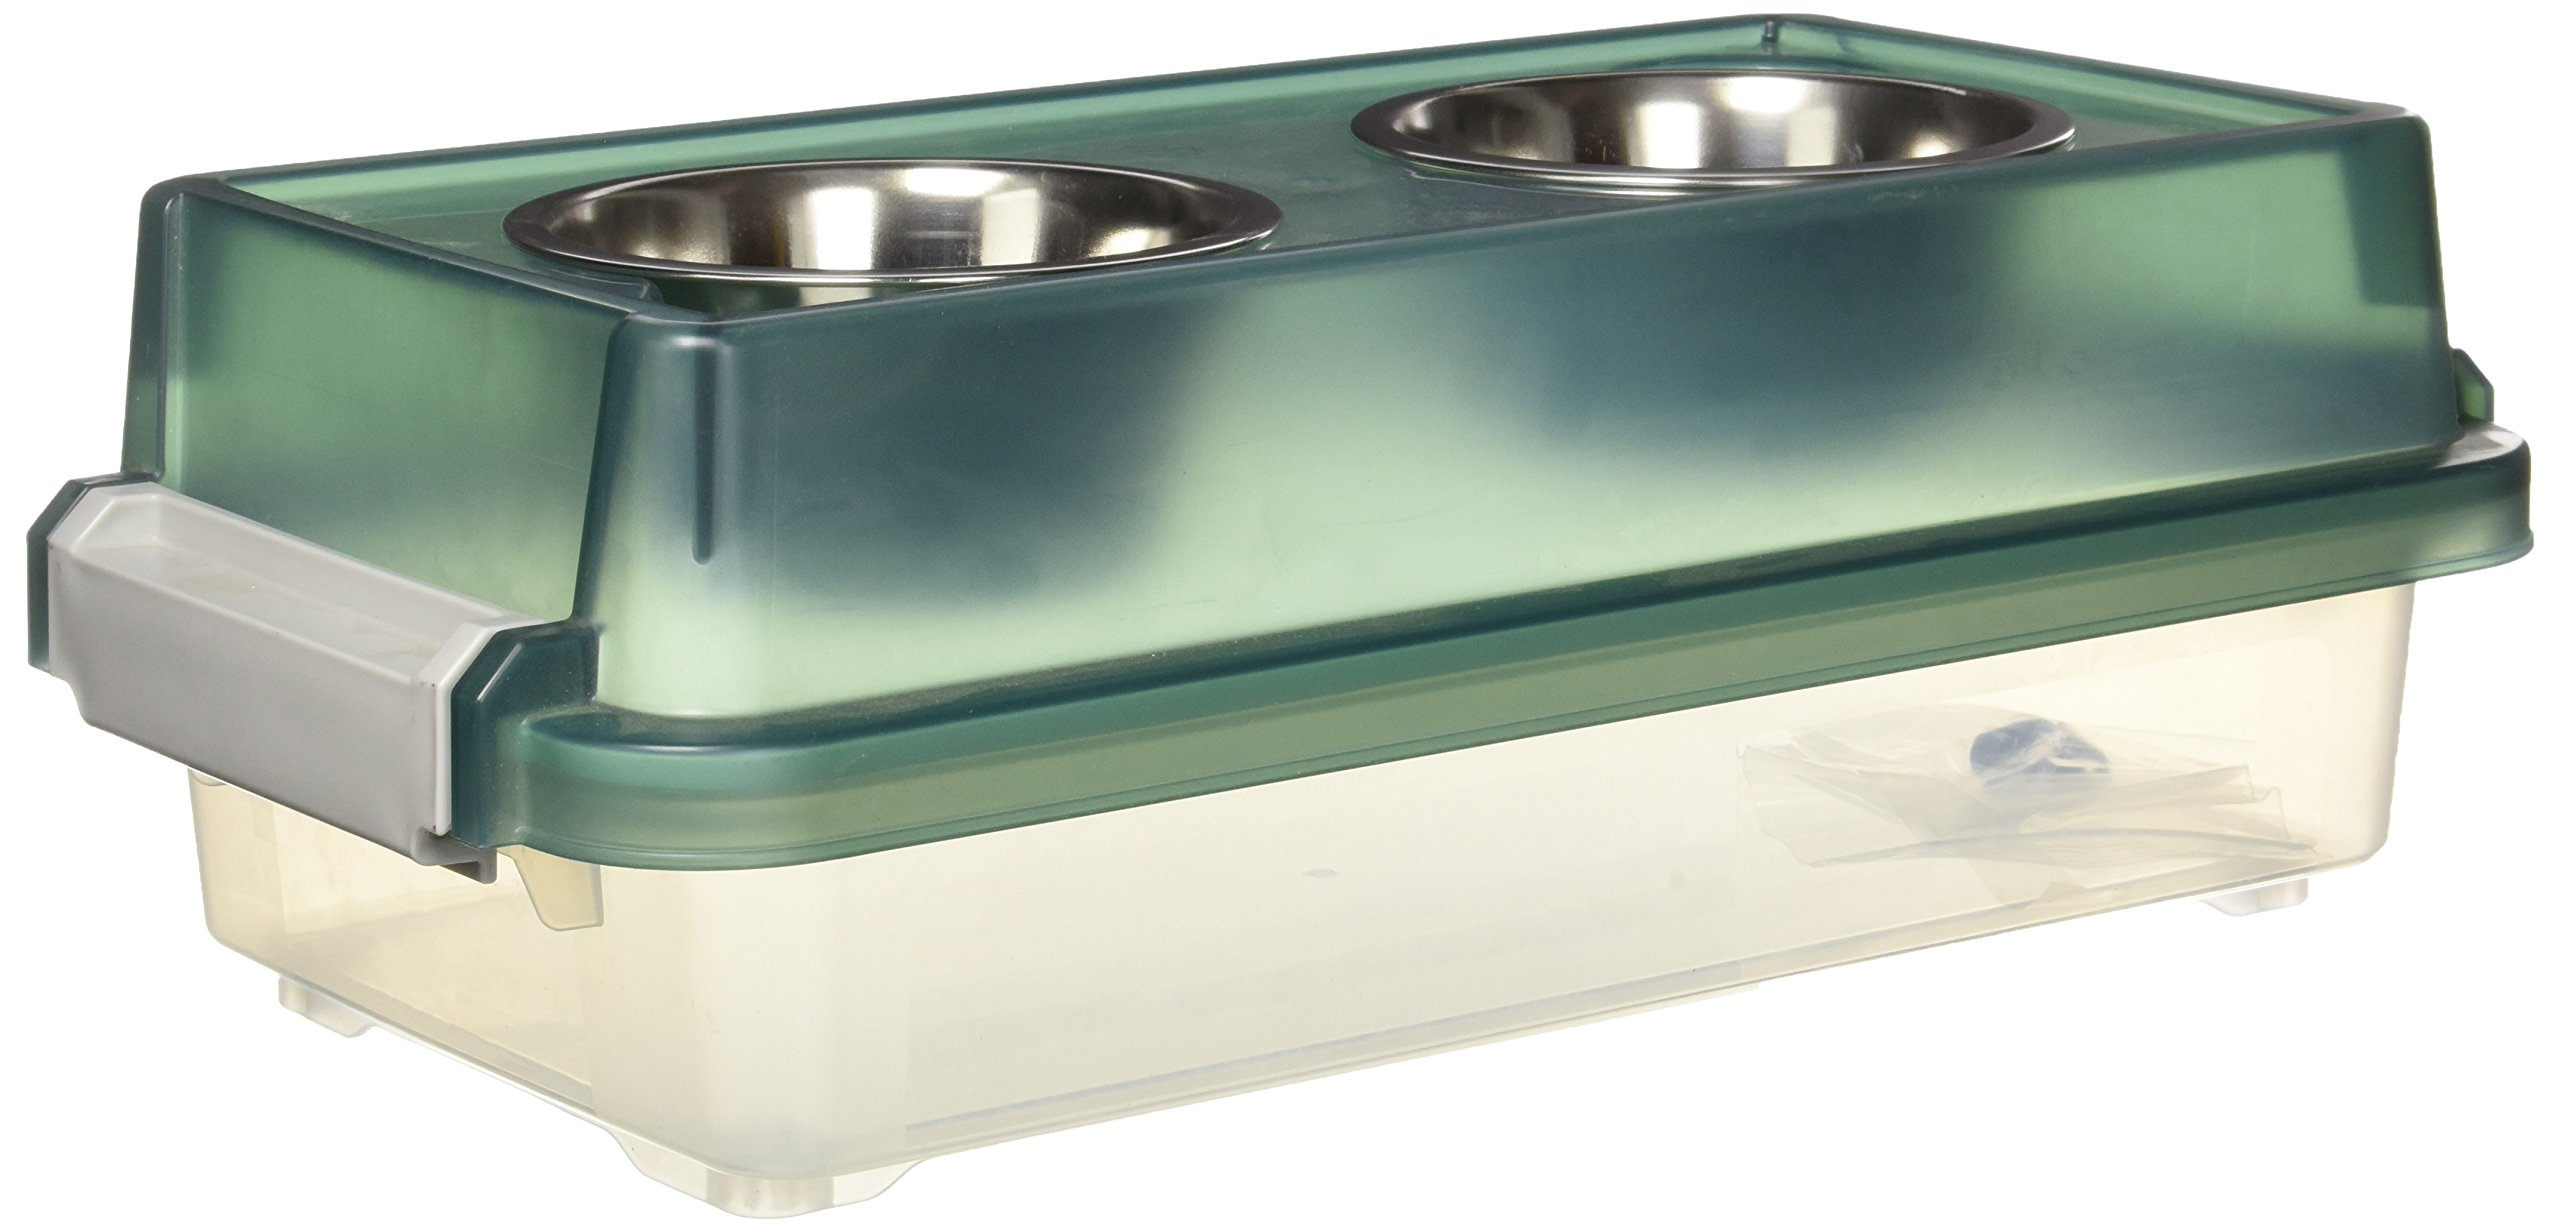 IRIS USA, Inc. IRIS Small Elevated Feeder with Airtight storage, Green